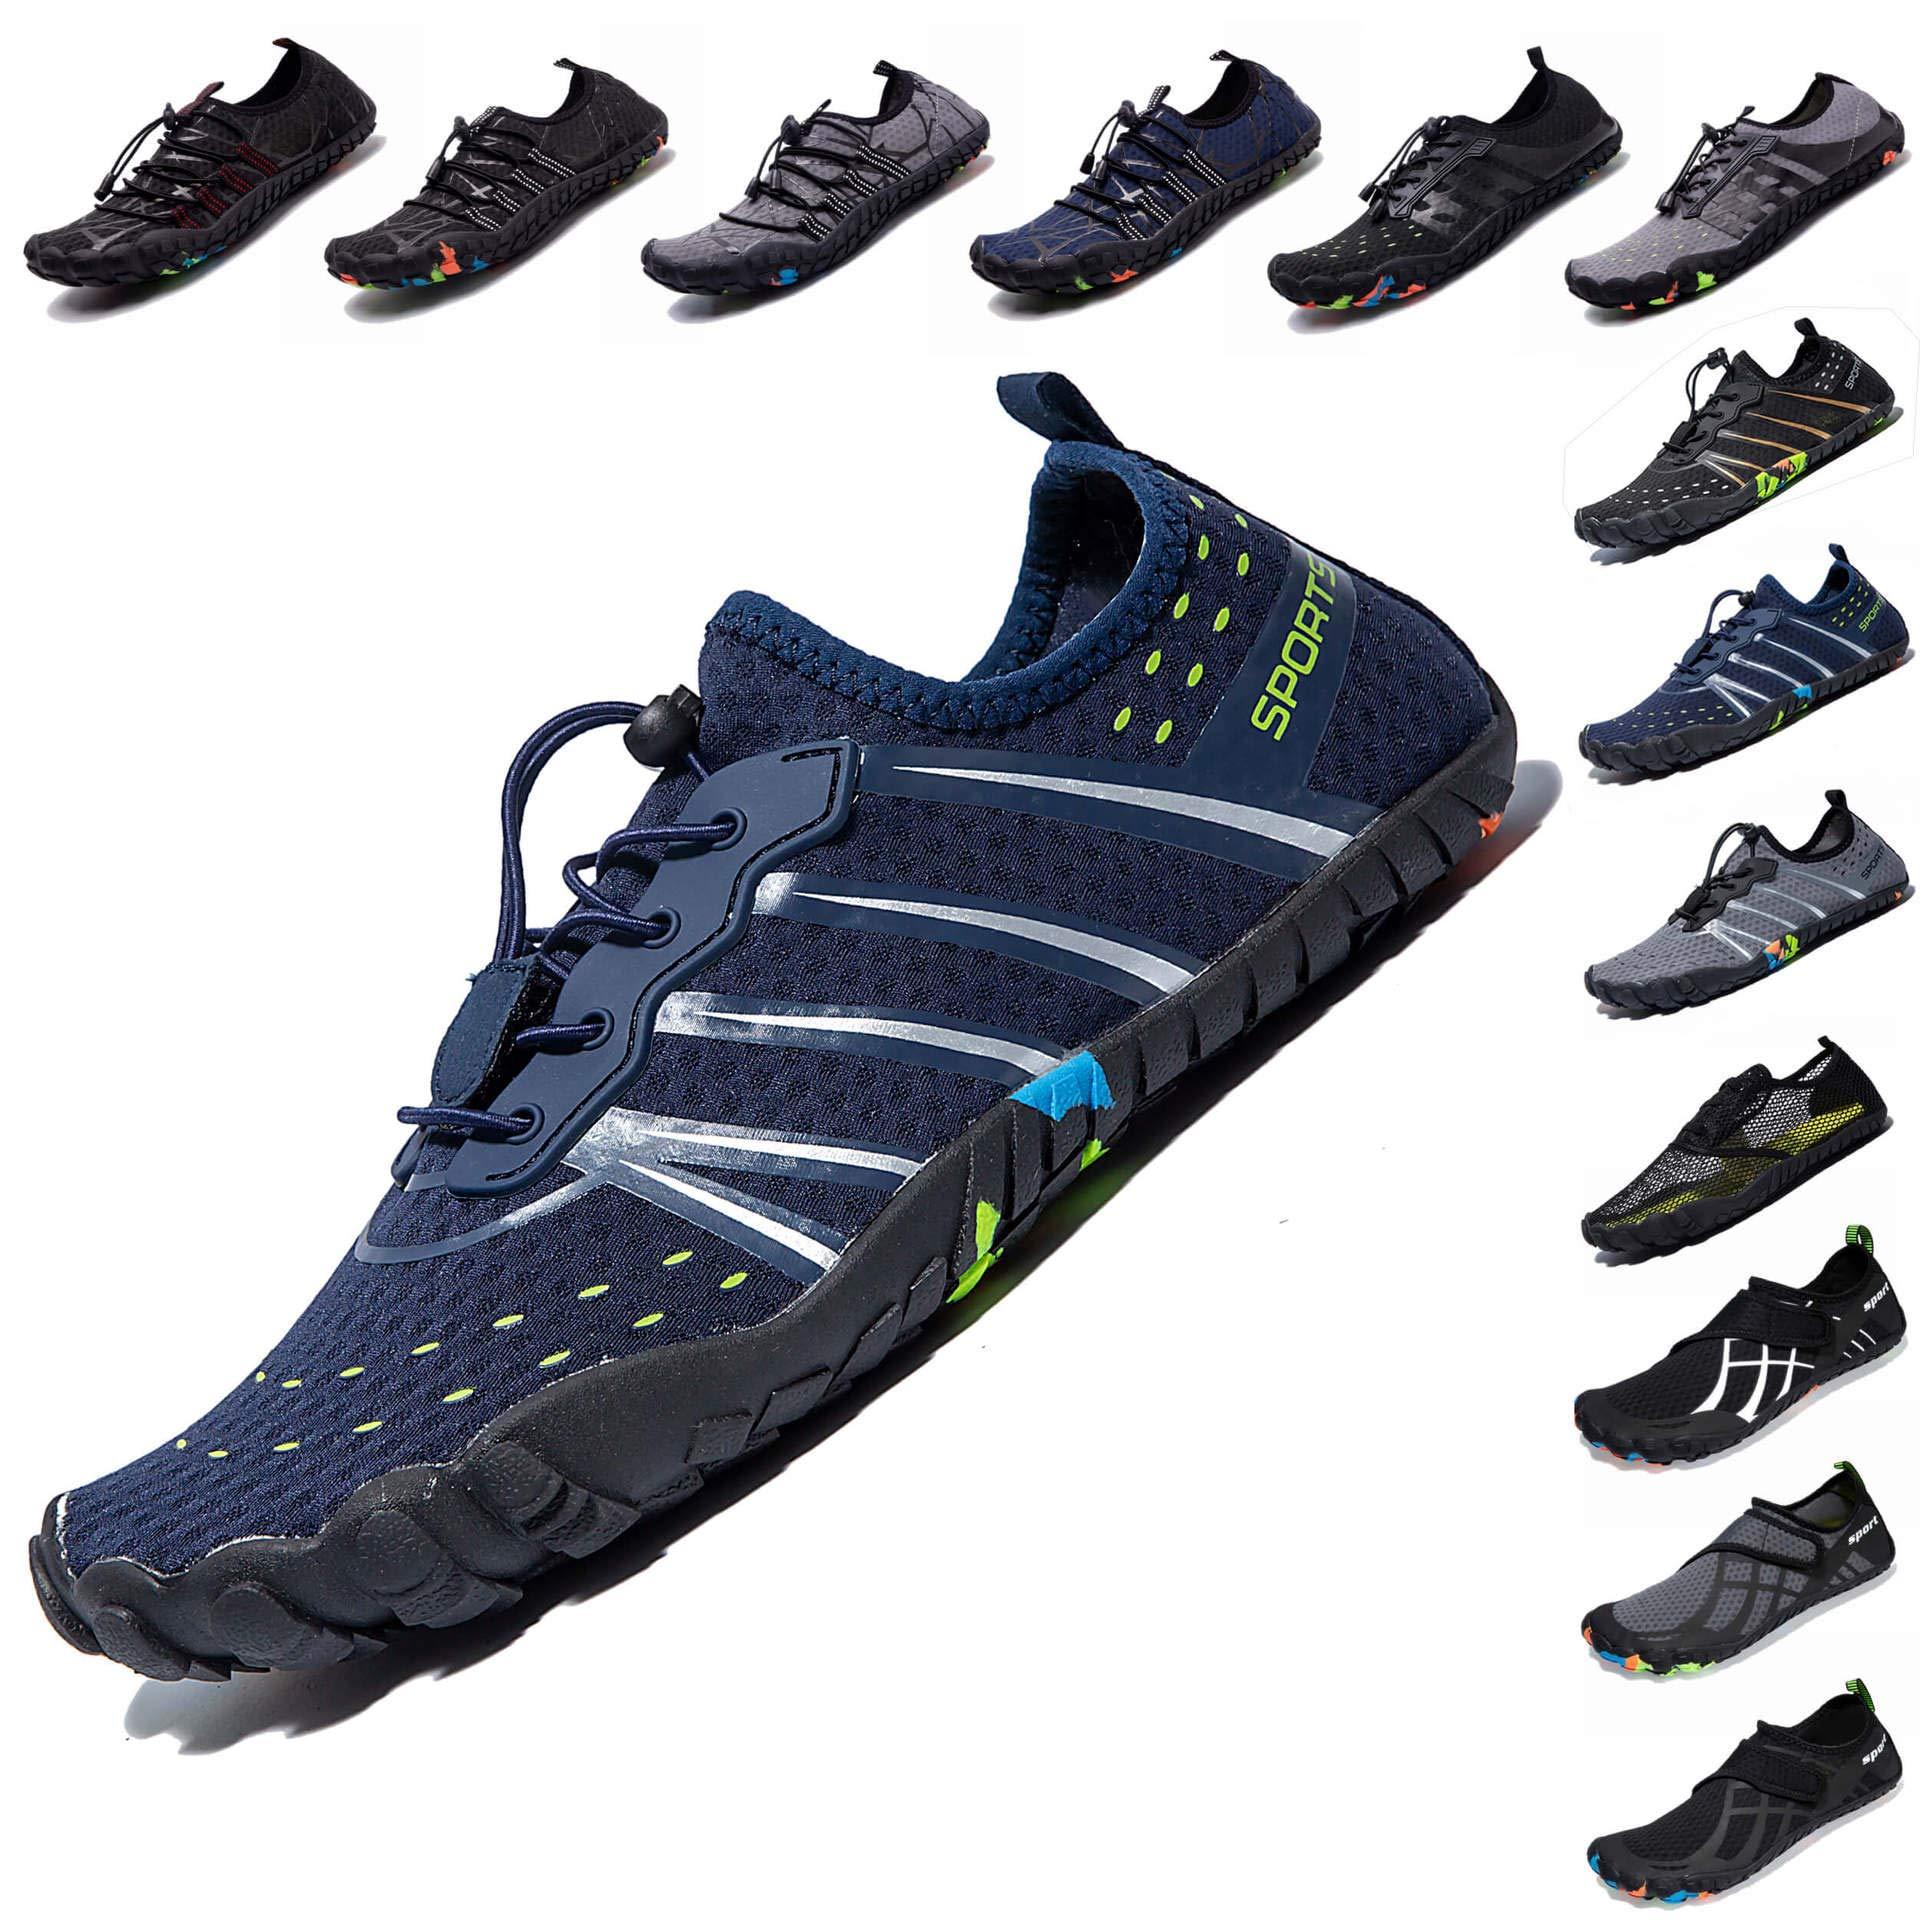 LINGTOM Mens Womens Aqua Water Shoes Quick Dry Barefoot Sports Exercise for Walking Swimming Diving Beach Surf Pool Yoga,Dark Blue 12.5 M US Women / 11 M US Men by LINGTOM (Image #1)